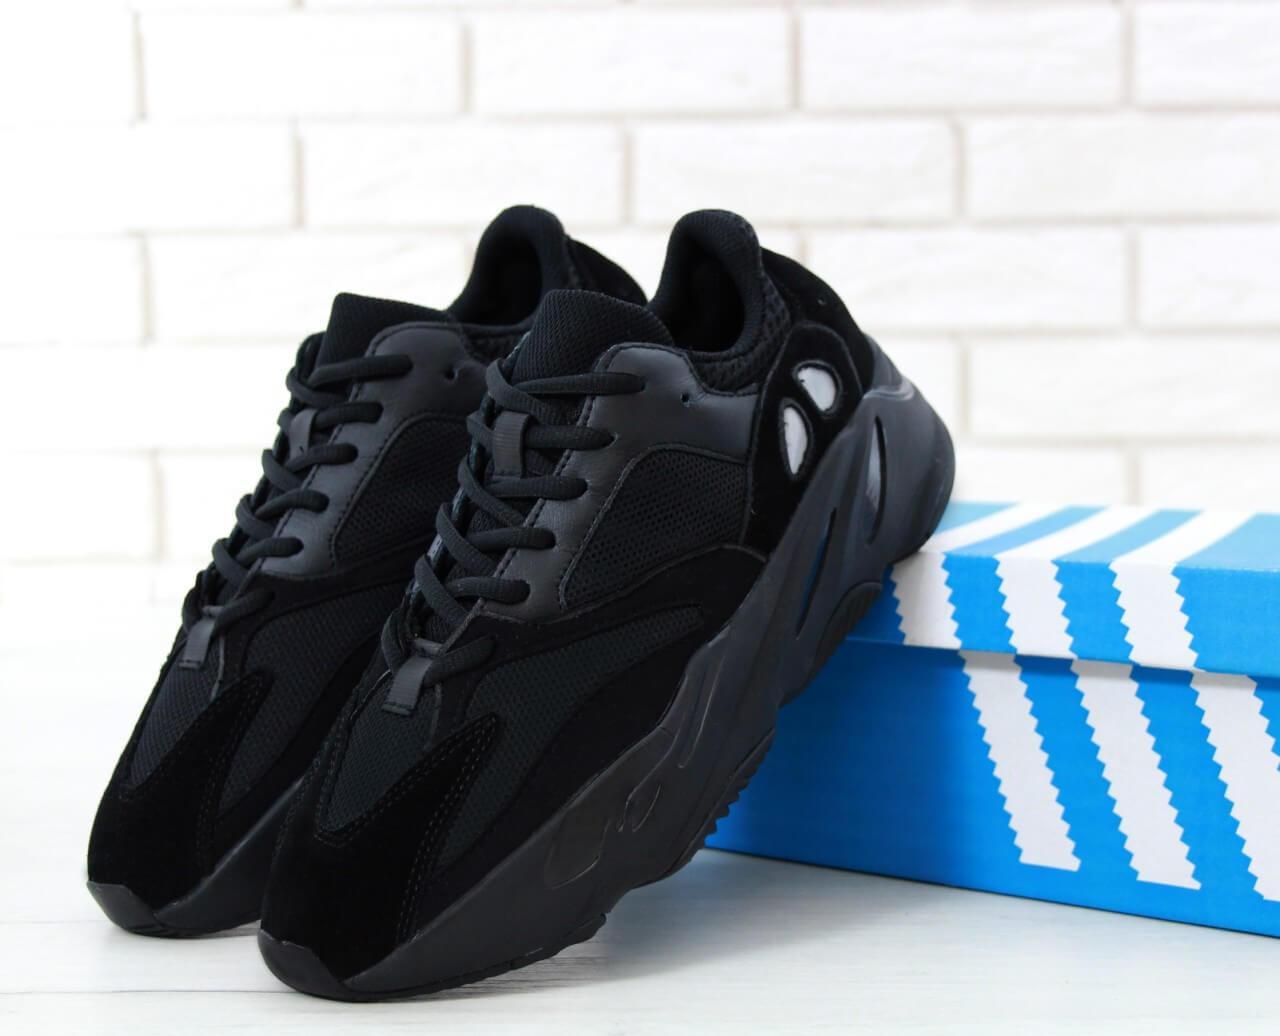 687116814 Кроссовки Adidas Yeezy Boost 700 Wave Runner Black - Интернет магазин обуви  «im-РоLLi